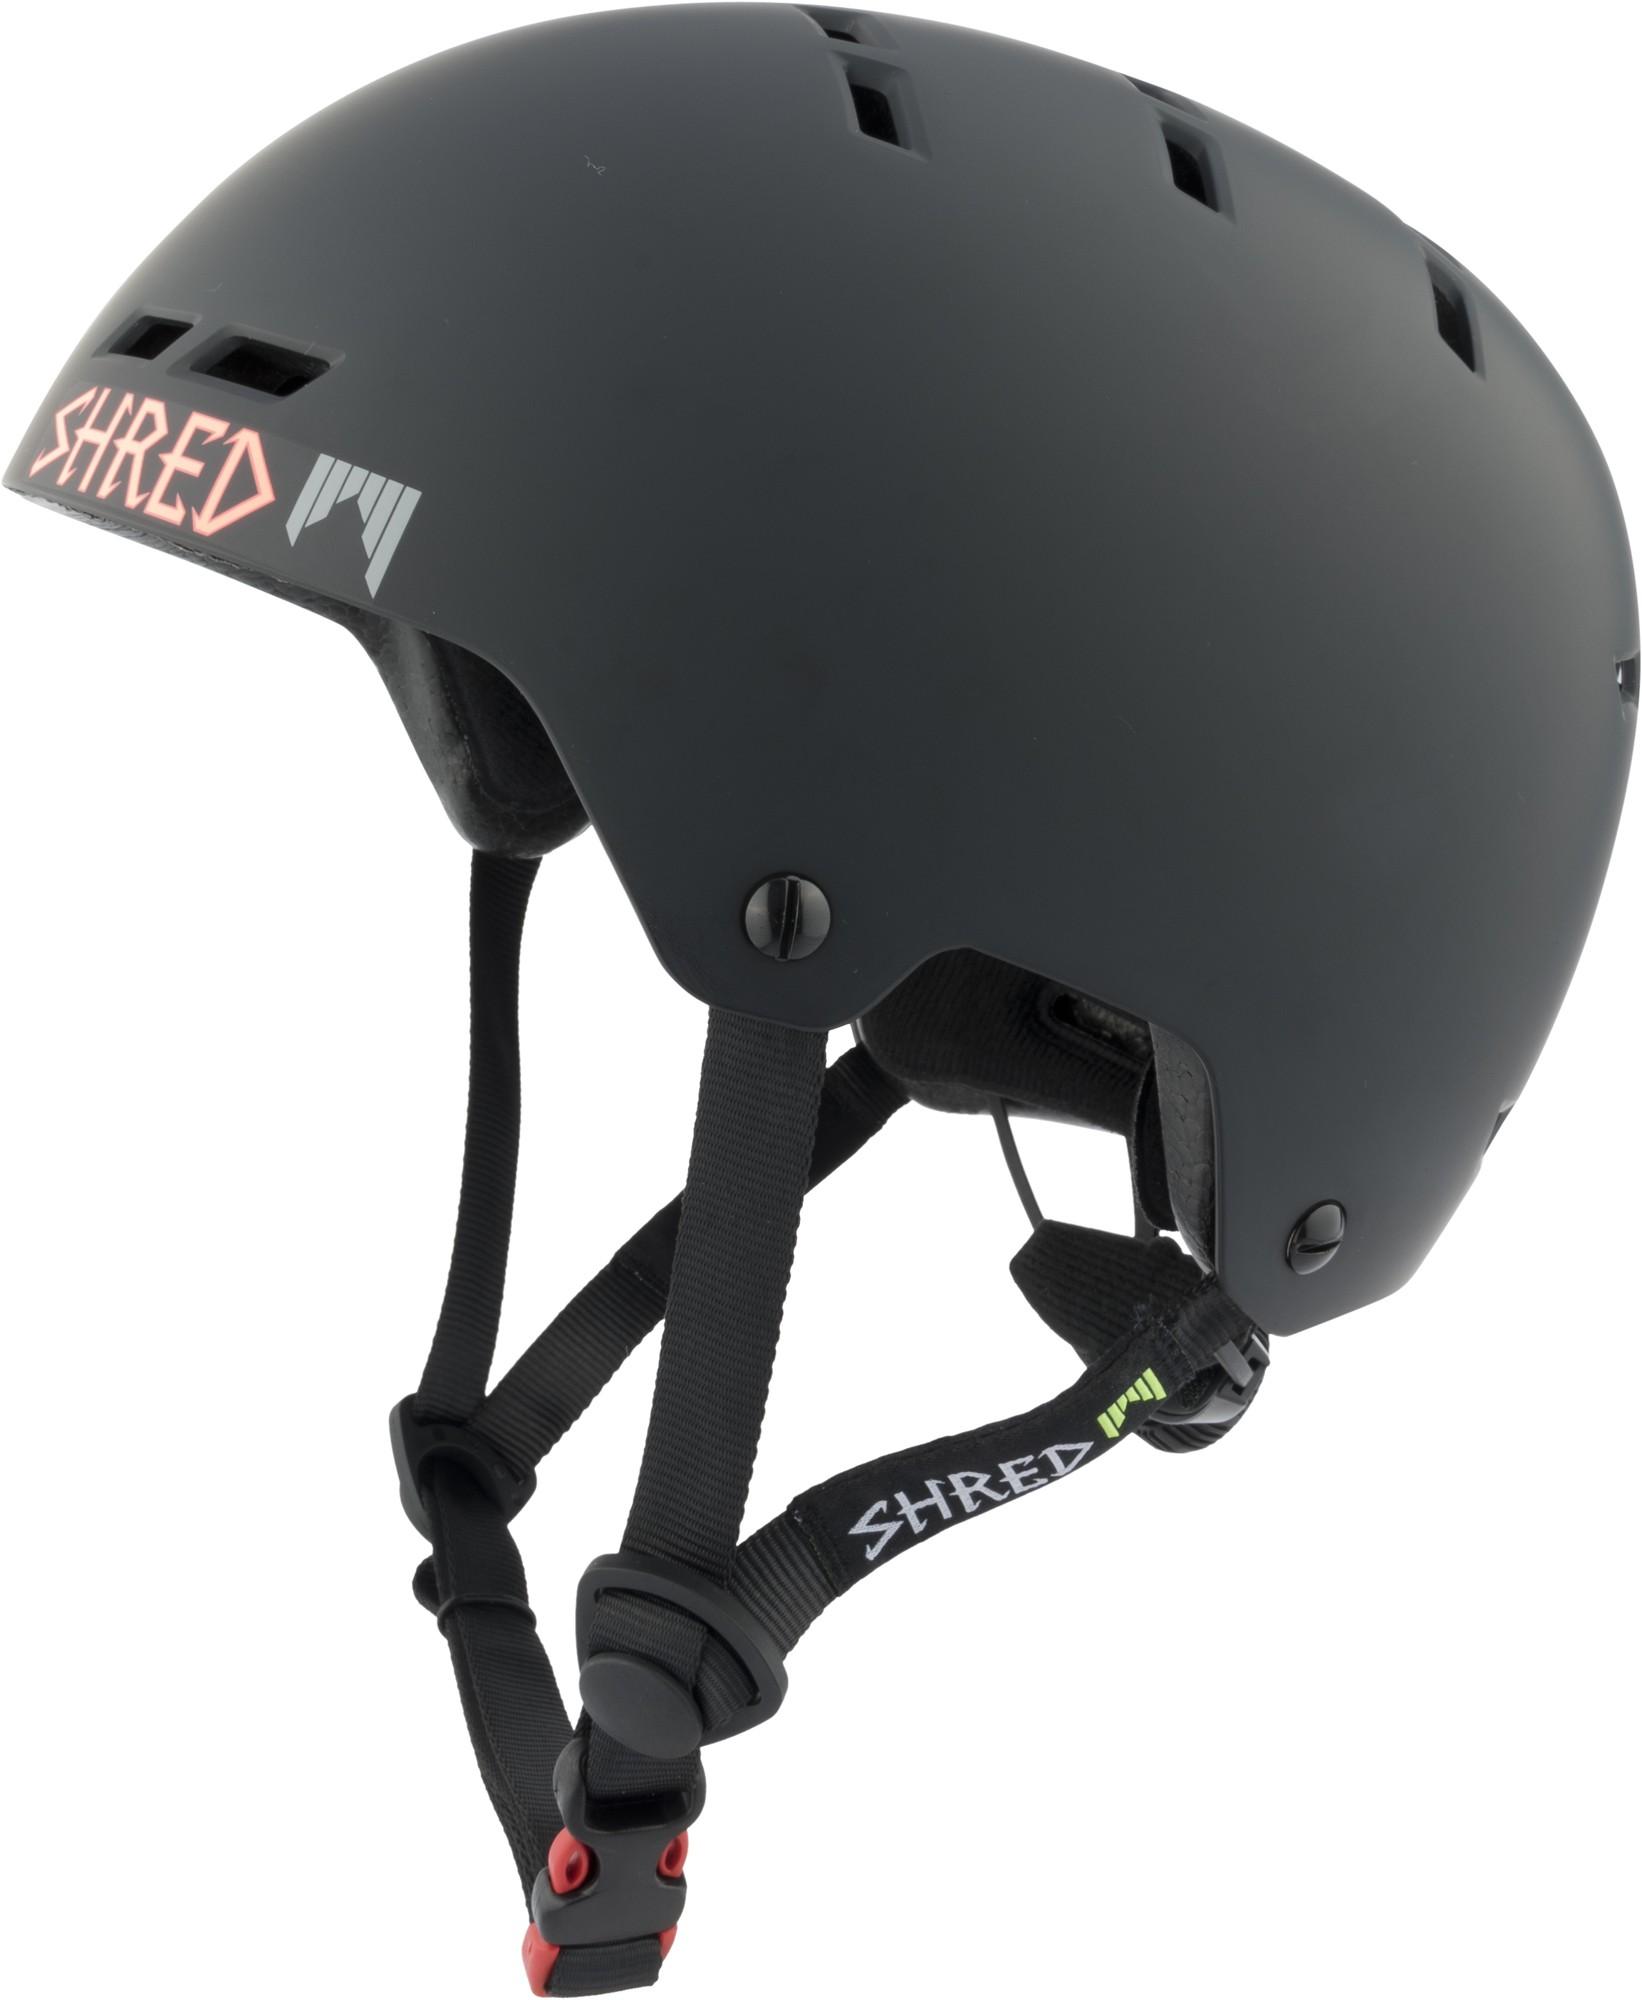 Shred BUMPER NoShock light CREDIT CARD helmet, 2017